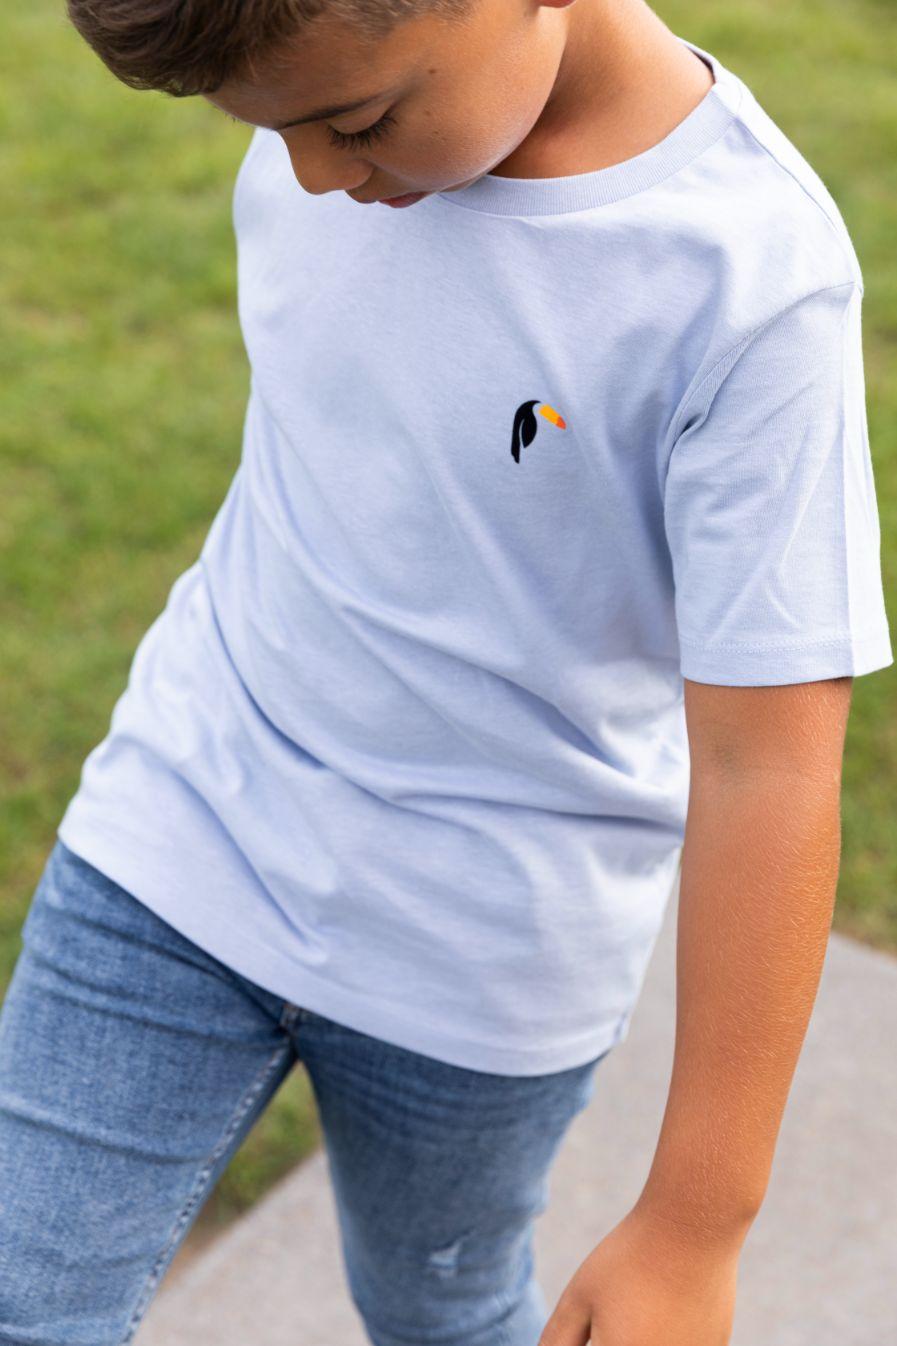 Kiddo - T-shirt Ice Blue - Tucan